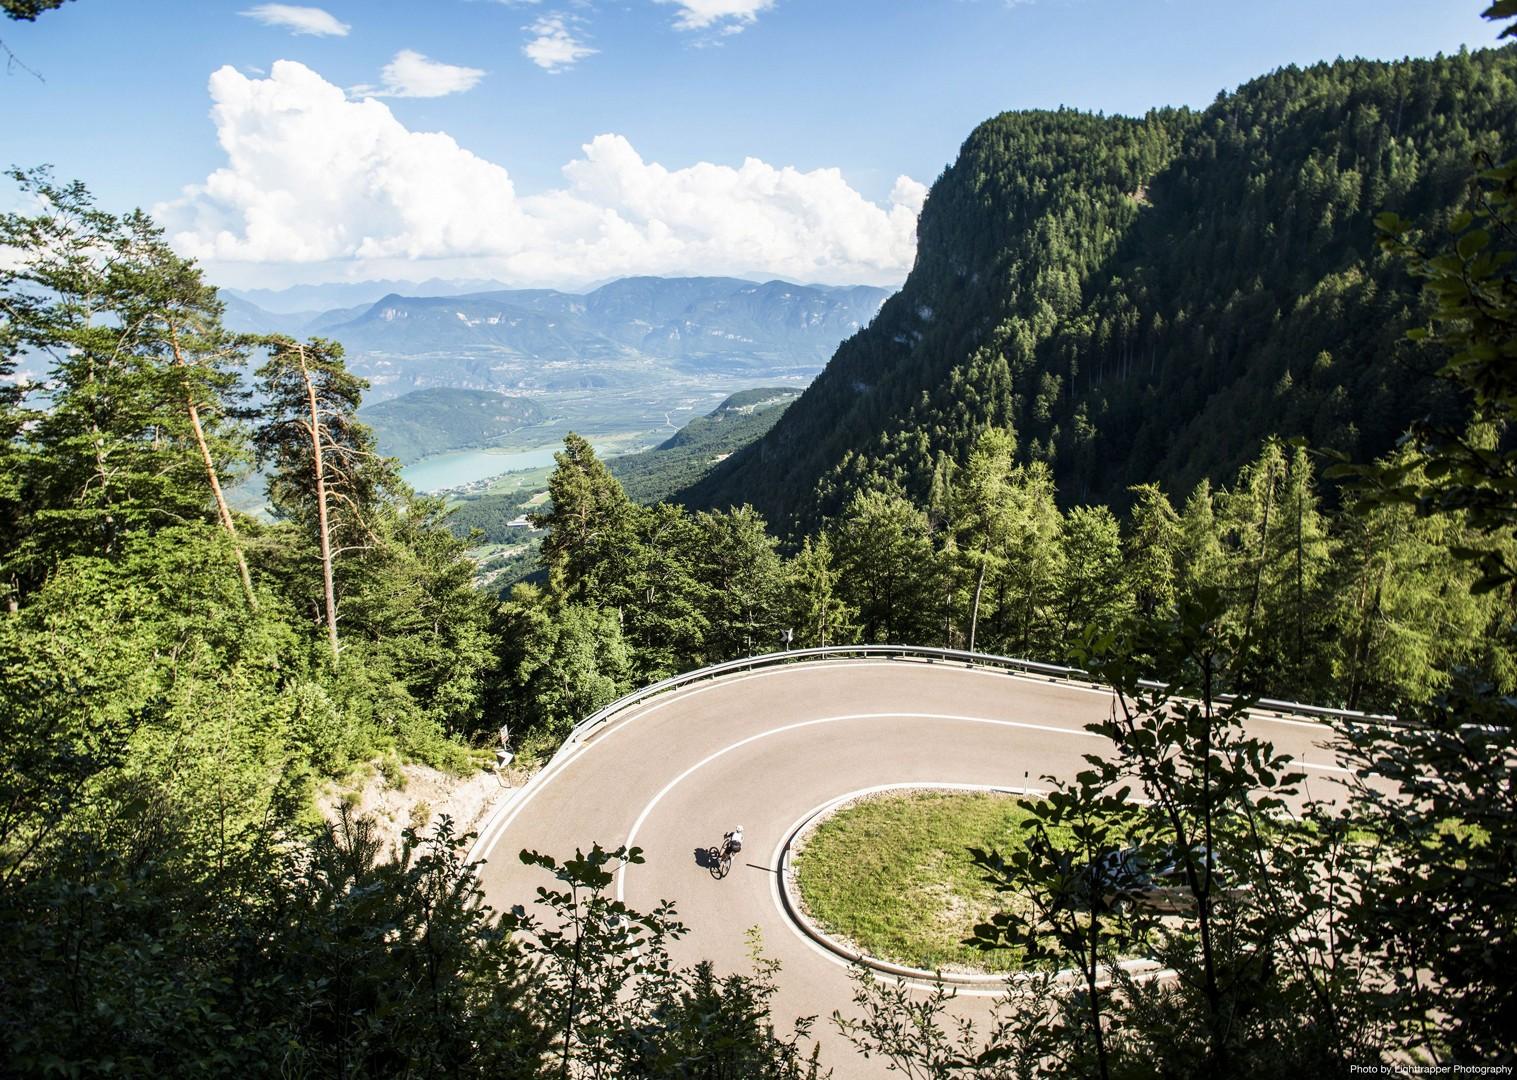 guided-road-cycling-holiday-italy-italian-alps.jpg - Italy - Italian Alps - Guided Road Cycling Holiday - Italia Road Cycling